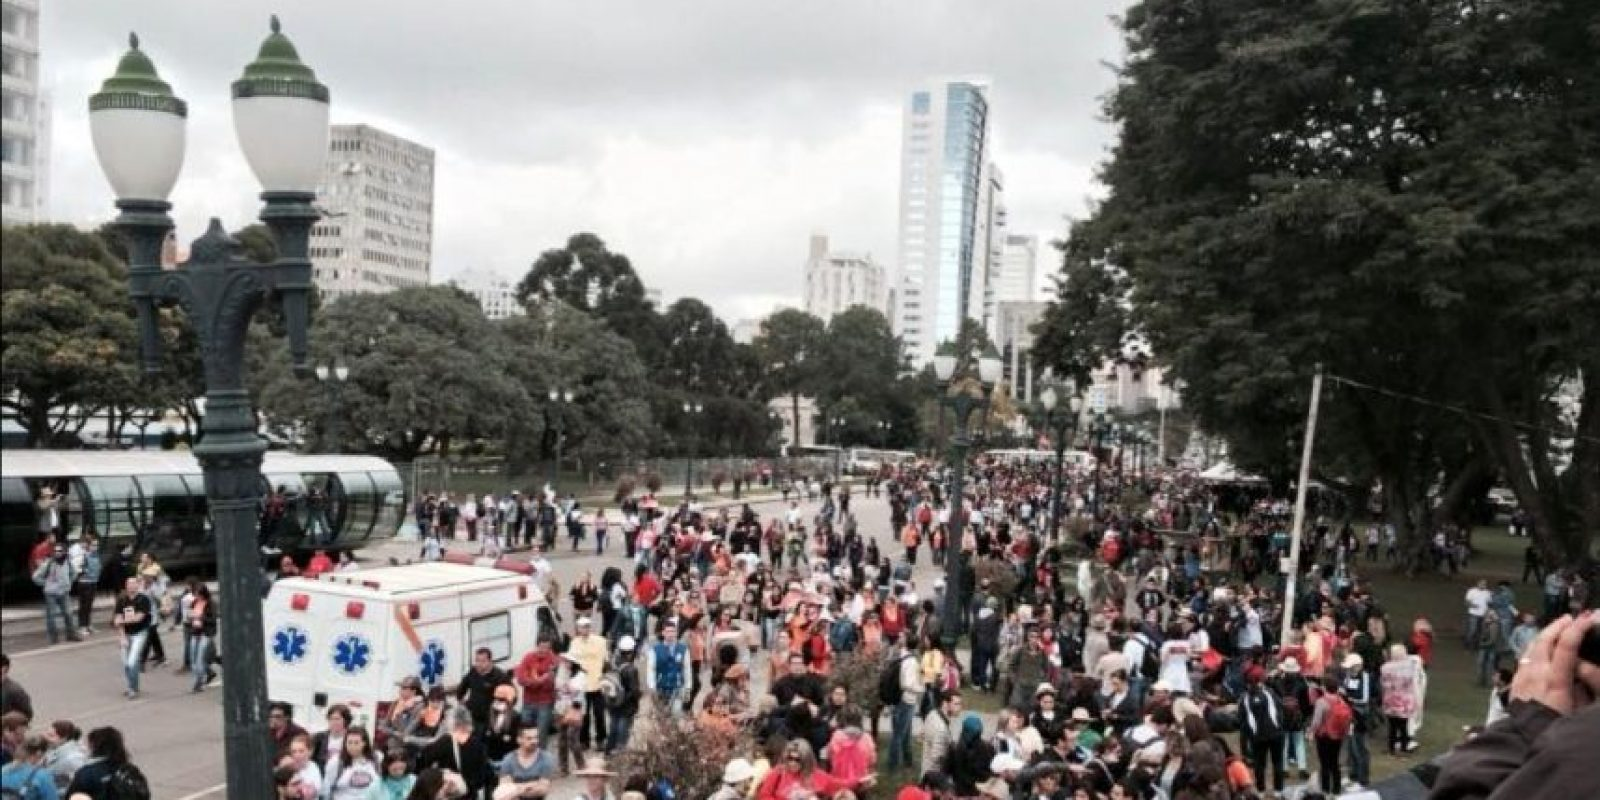 Así lucían los manifestantes en Curitiba. Foto:Vía Twitter @syndicalisms